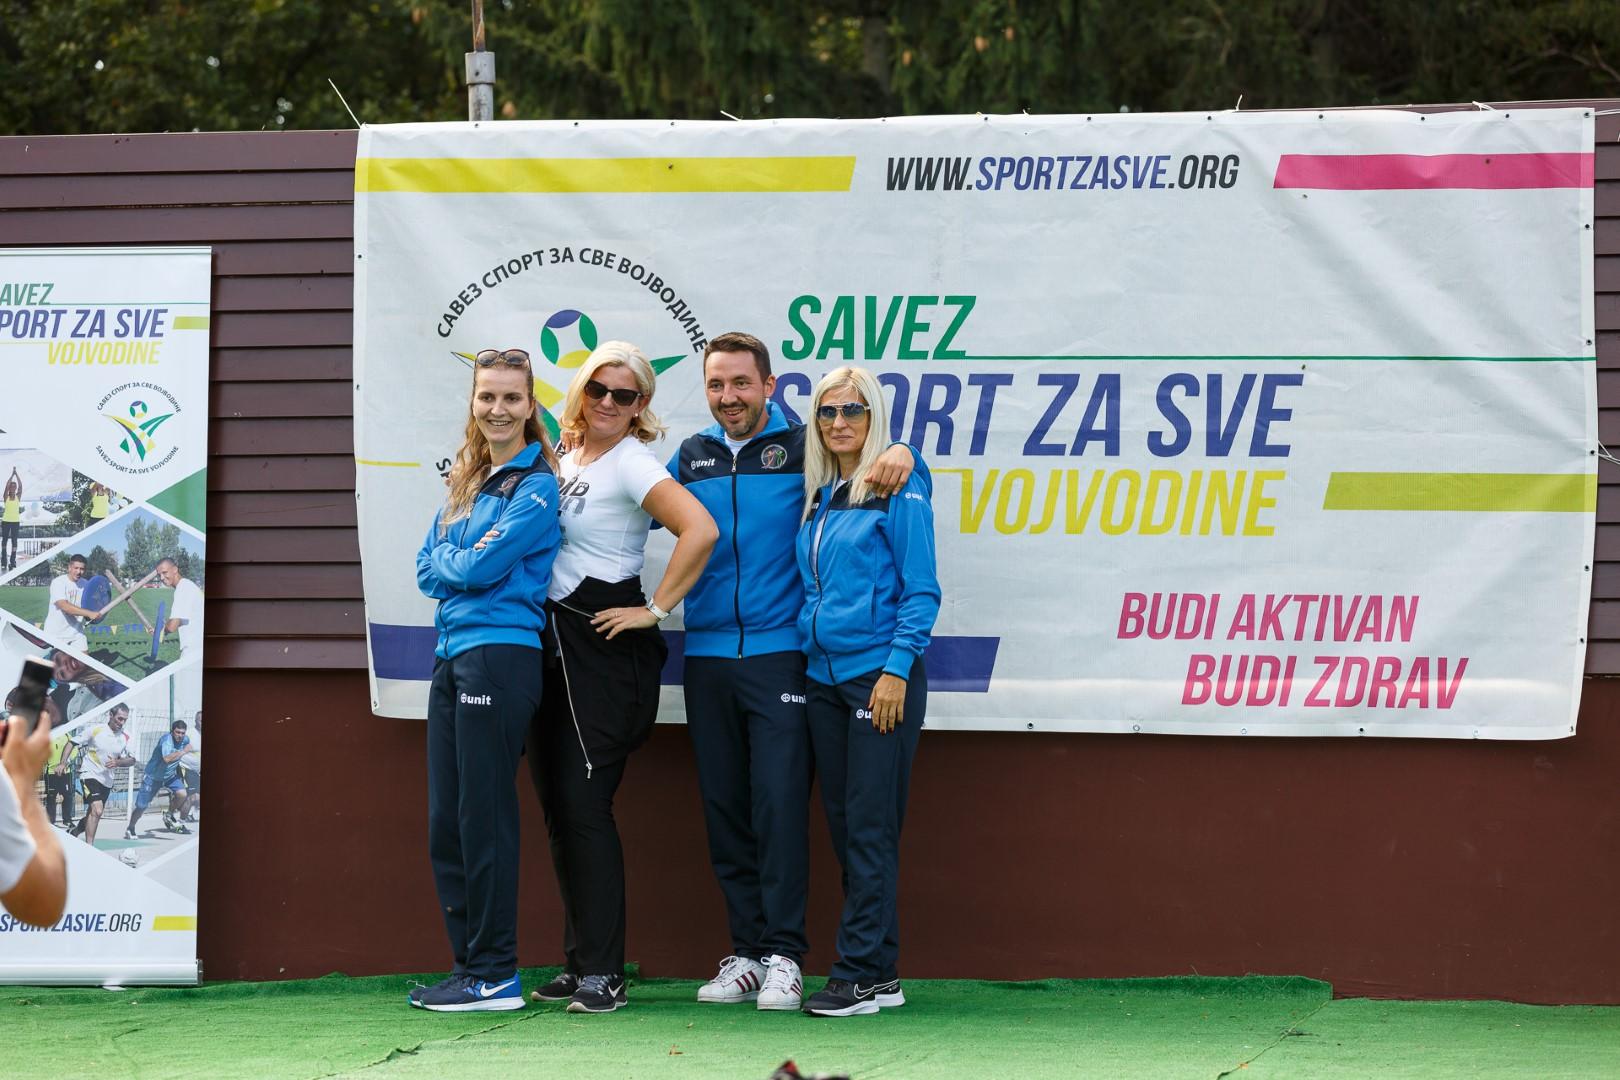 SSZSV_Letenka-_085